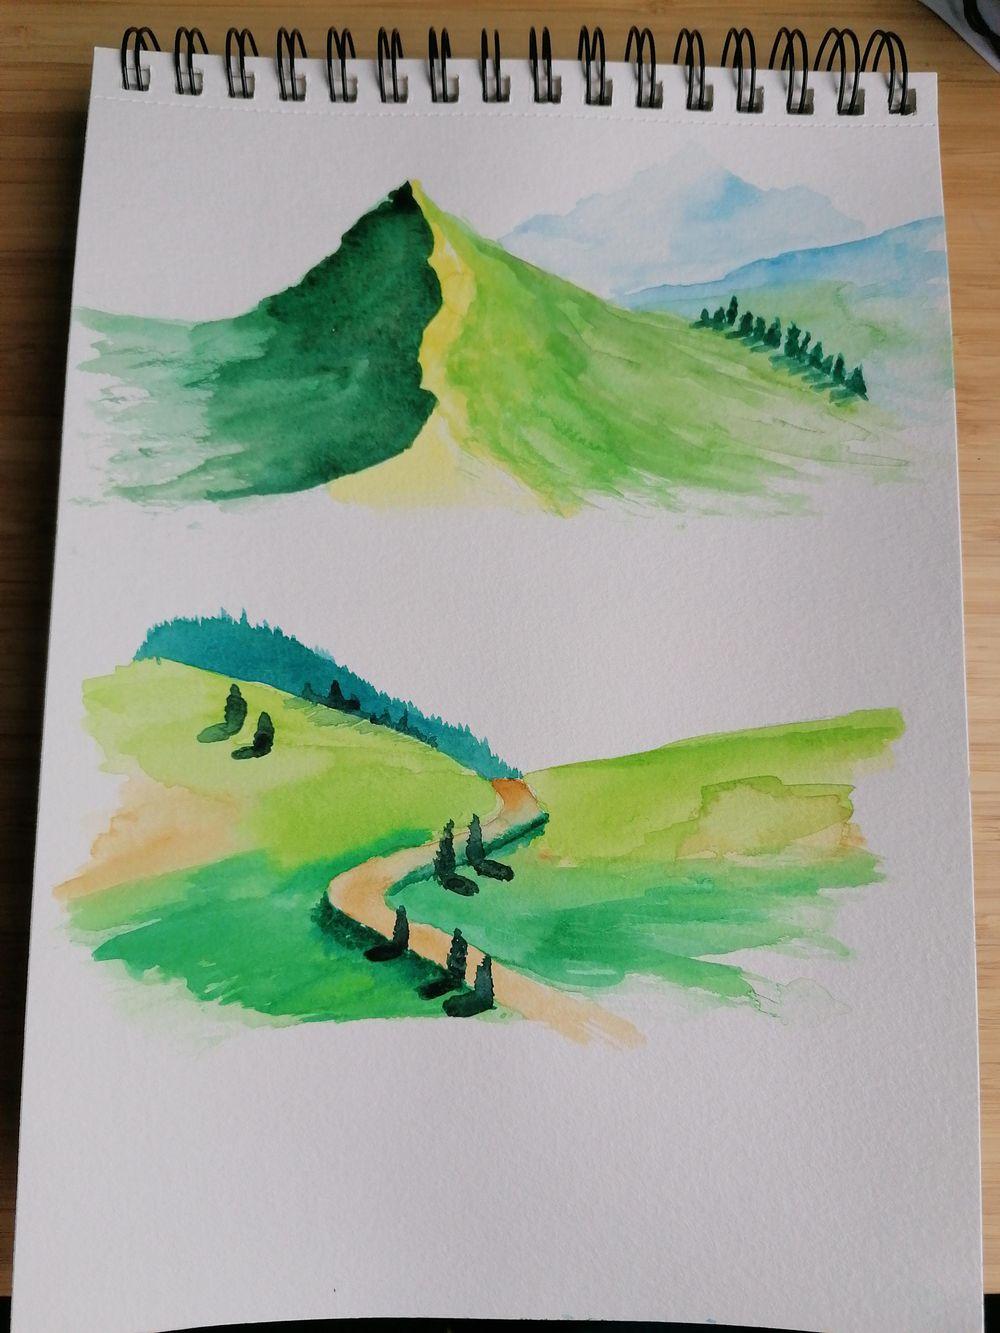 Watercolor landscape - image 4 - student project